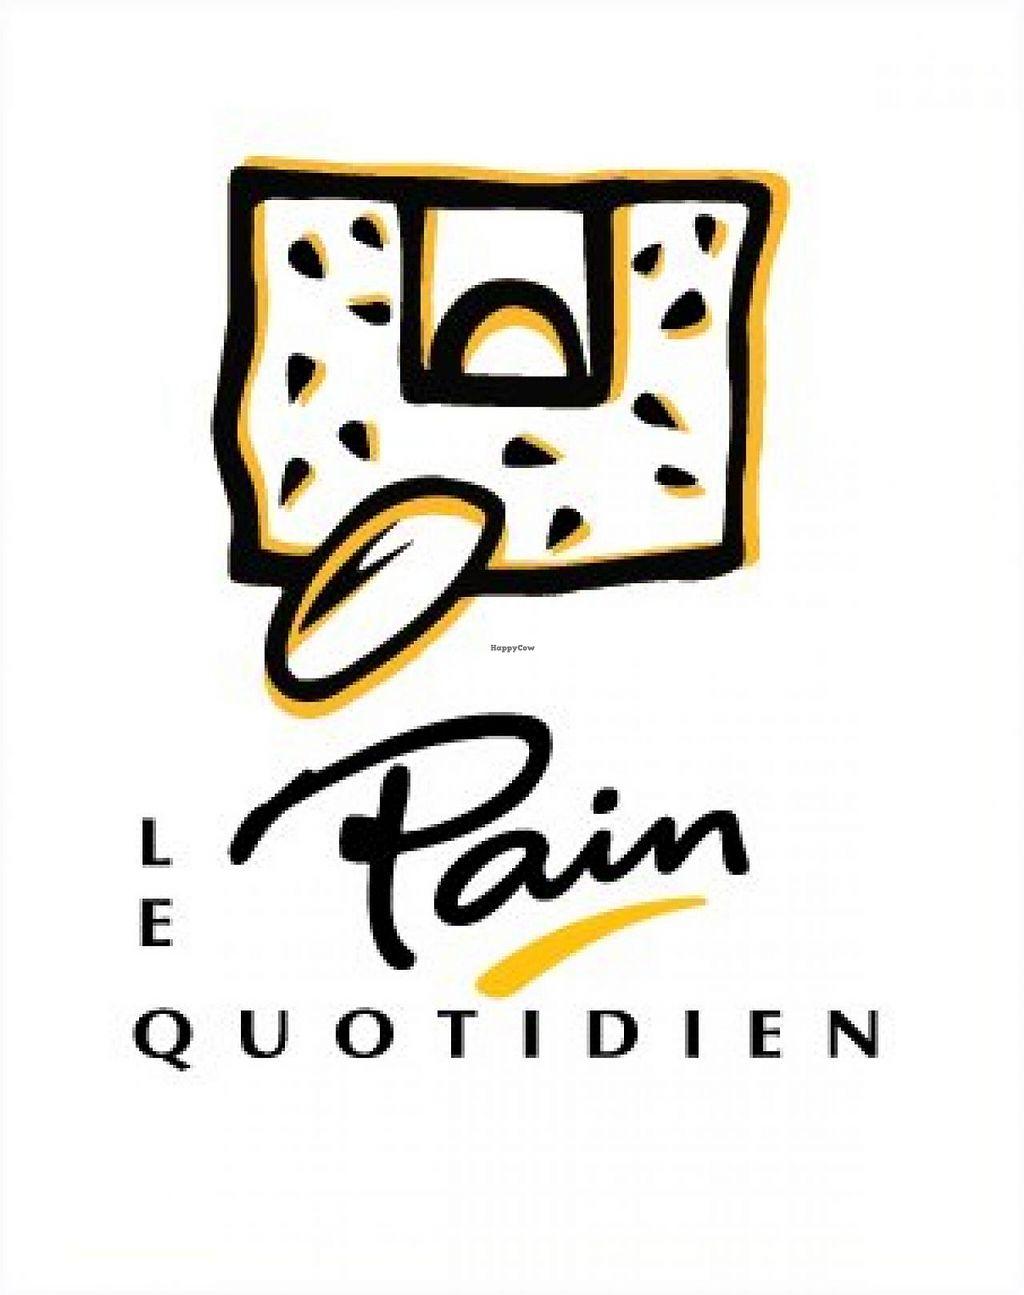 "Photo of Le Pain Quotidien - De Pijp  by <a href=""/members/profile/community"">community</a> <br/>Le Pain Quotidien <br/> July 24, 2014  - <a href='/contact/abuse/image/49185/74914'>Report</a>"